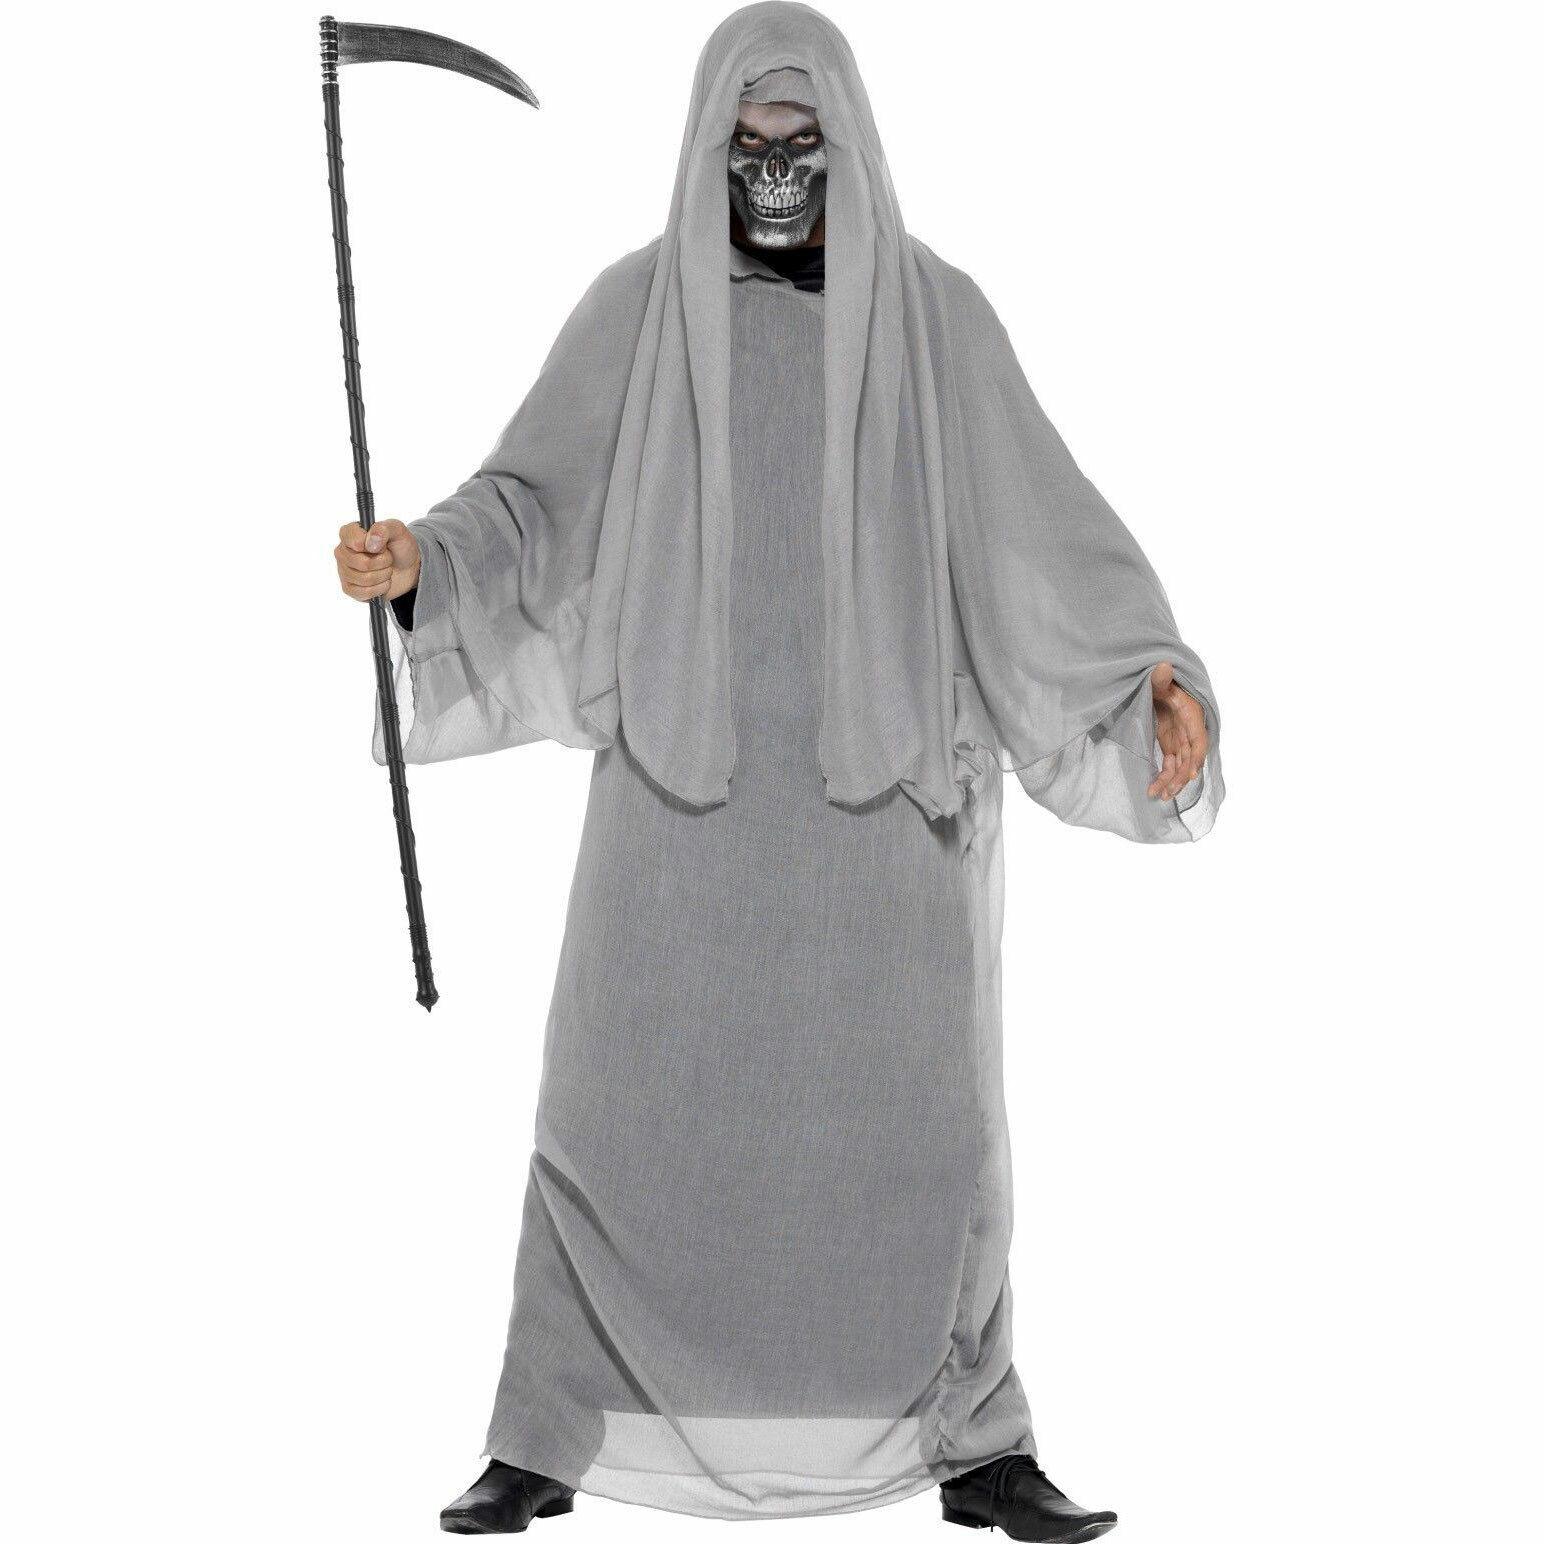 GREY GRIM REAPER HALLOWEEN COSTUME MENS GHOST SKELETON SCARY SCREAM HORROR ROBE